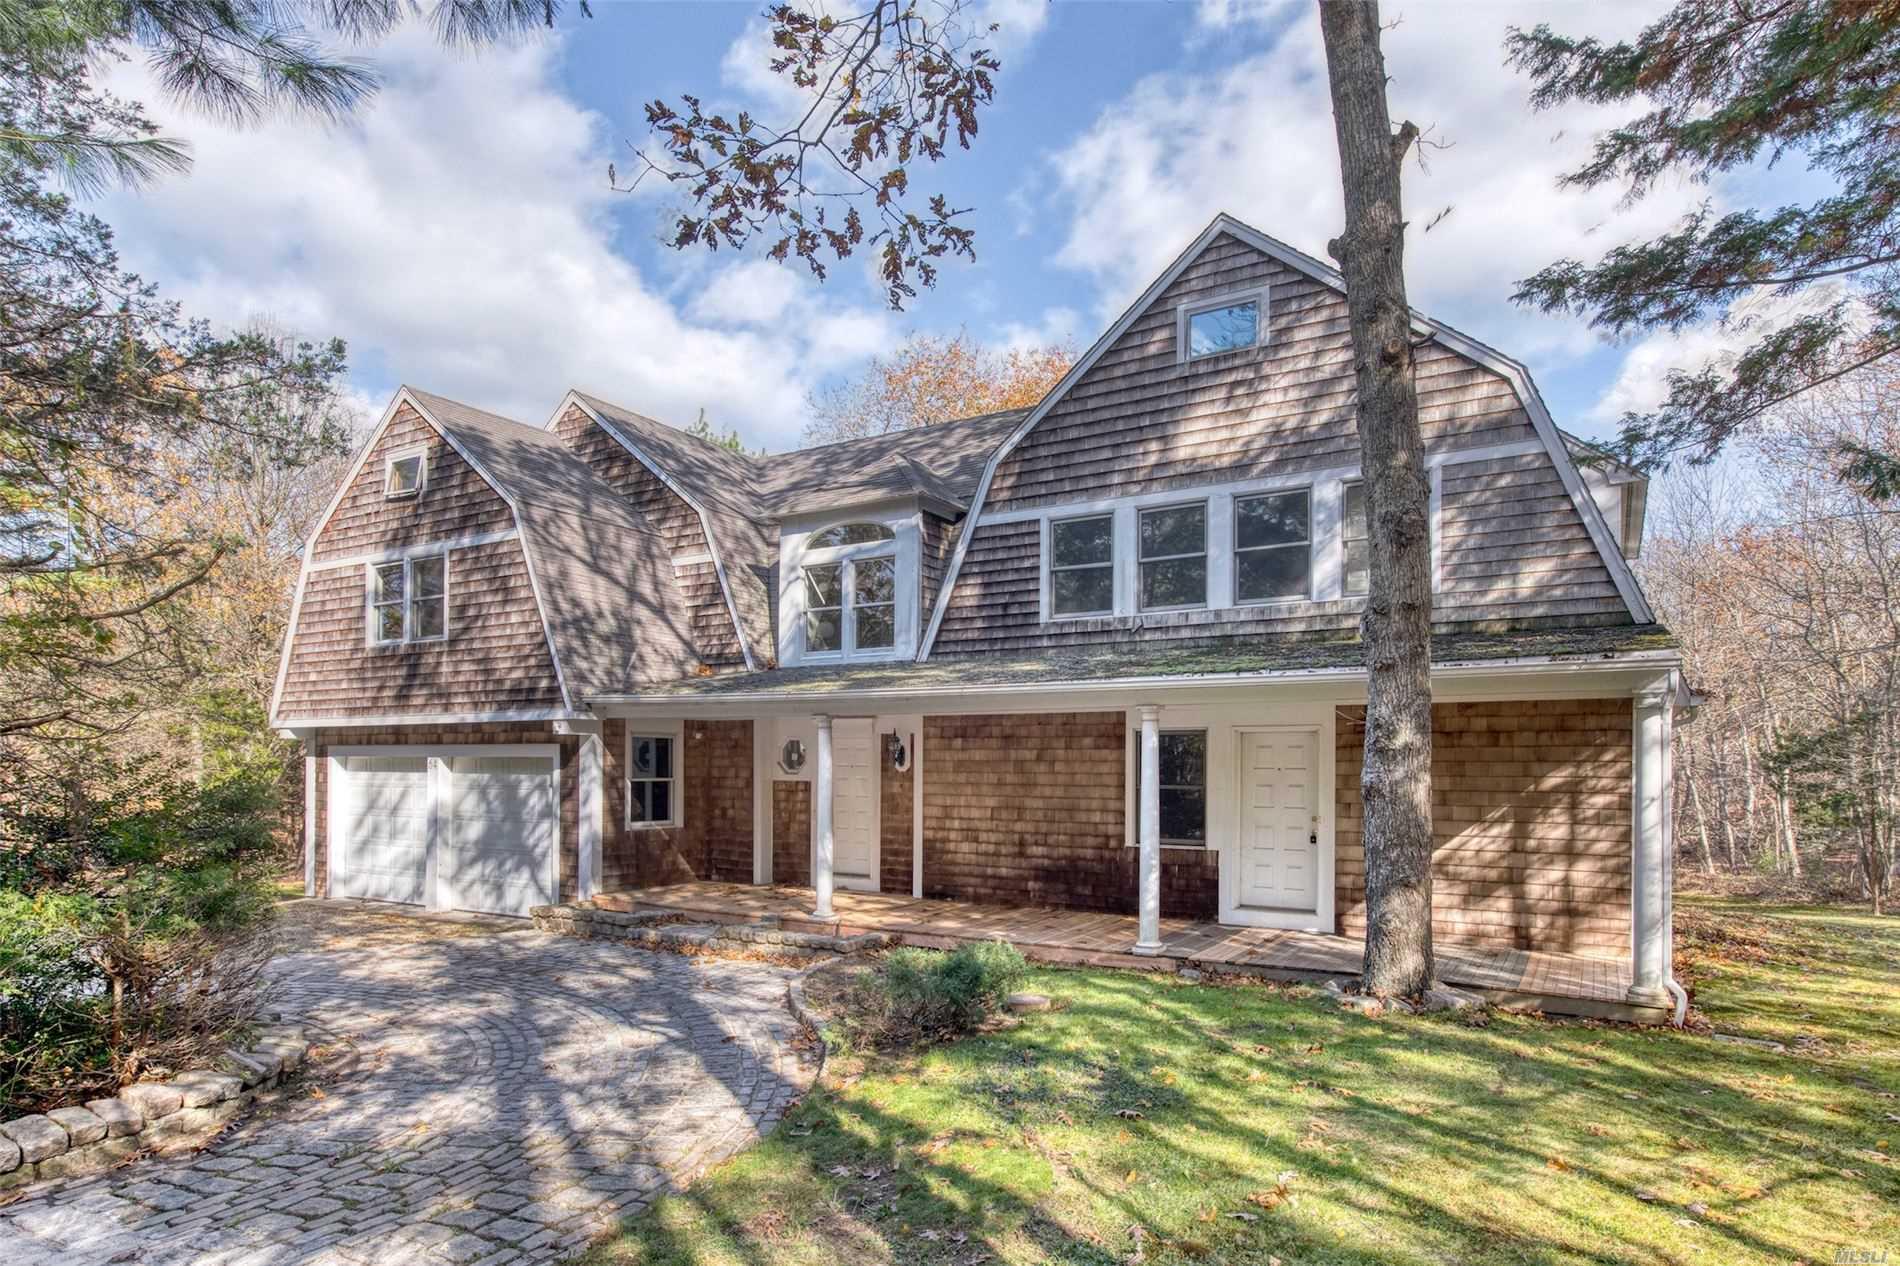 64 Springy Banks Rd, East Hampton, New York